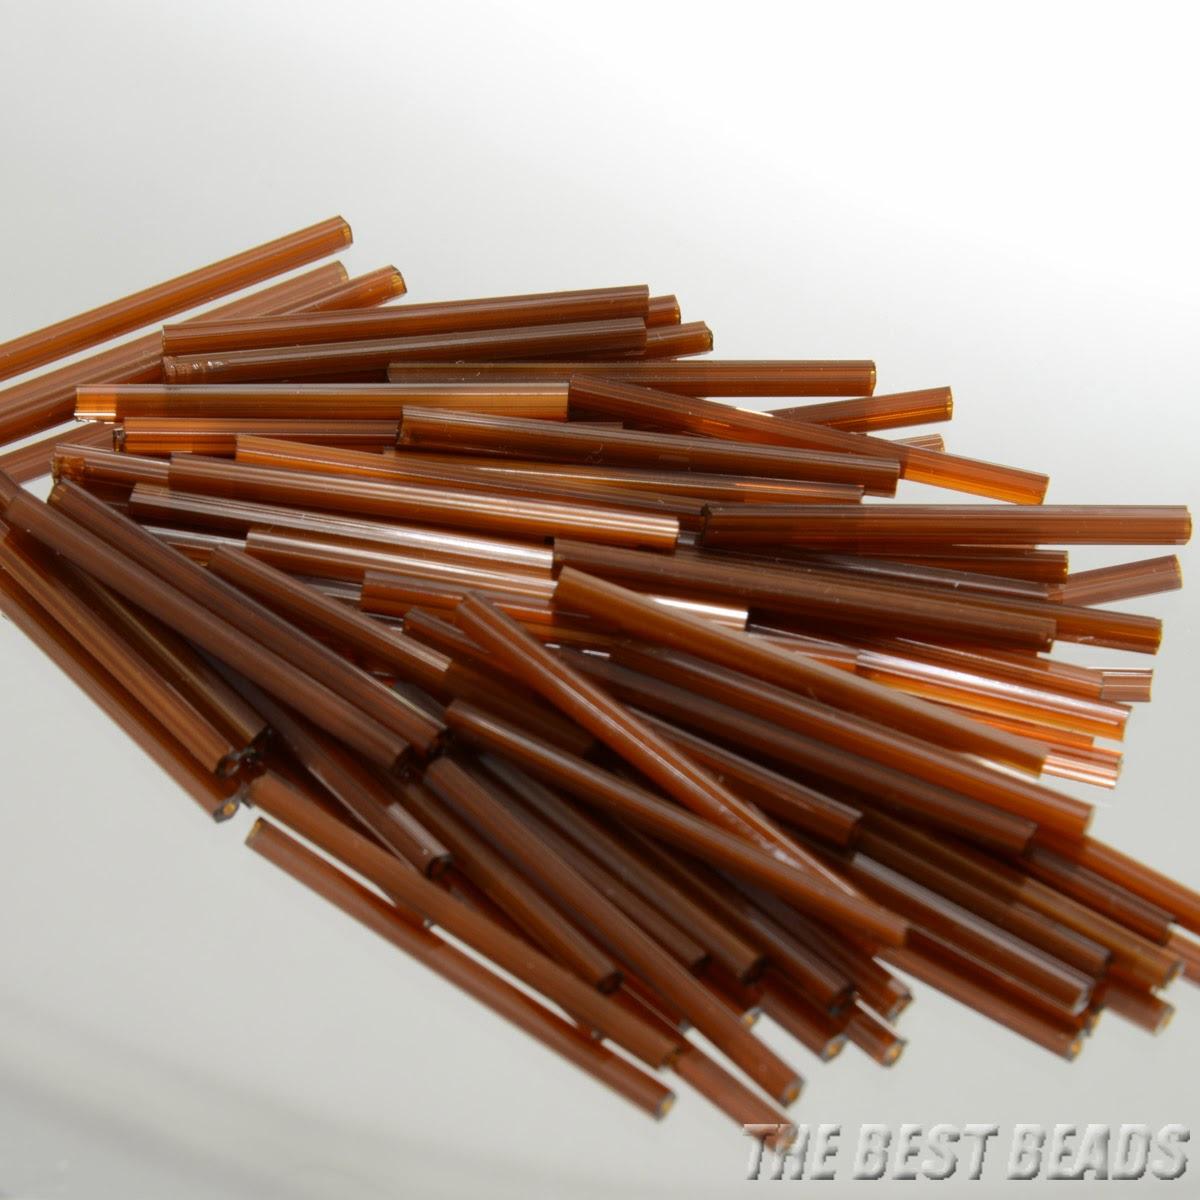 https://www.etsy.com/listing/198857895/15g-70pcs-silky-brown-bugle-beads-30mm